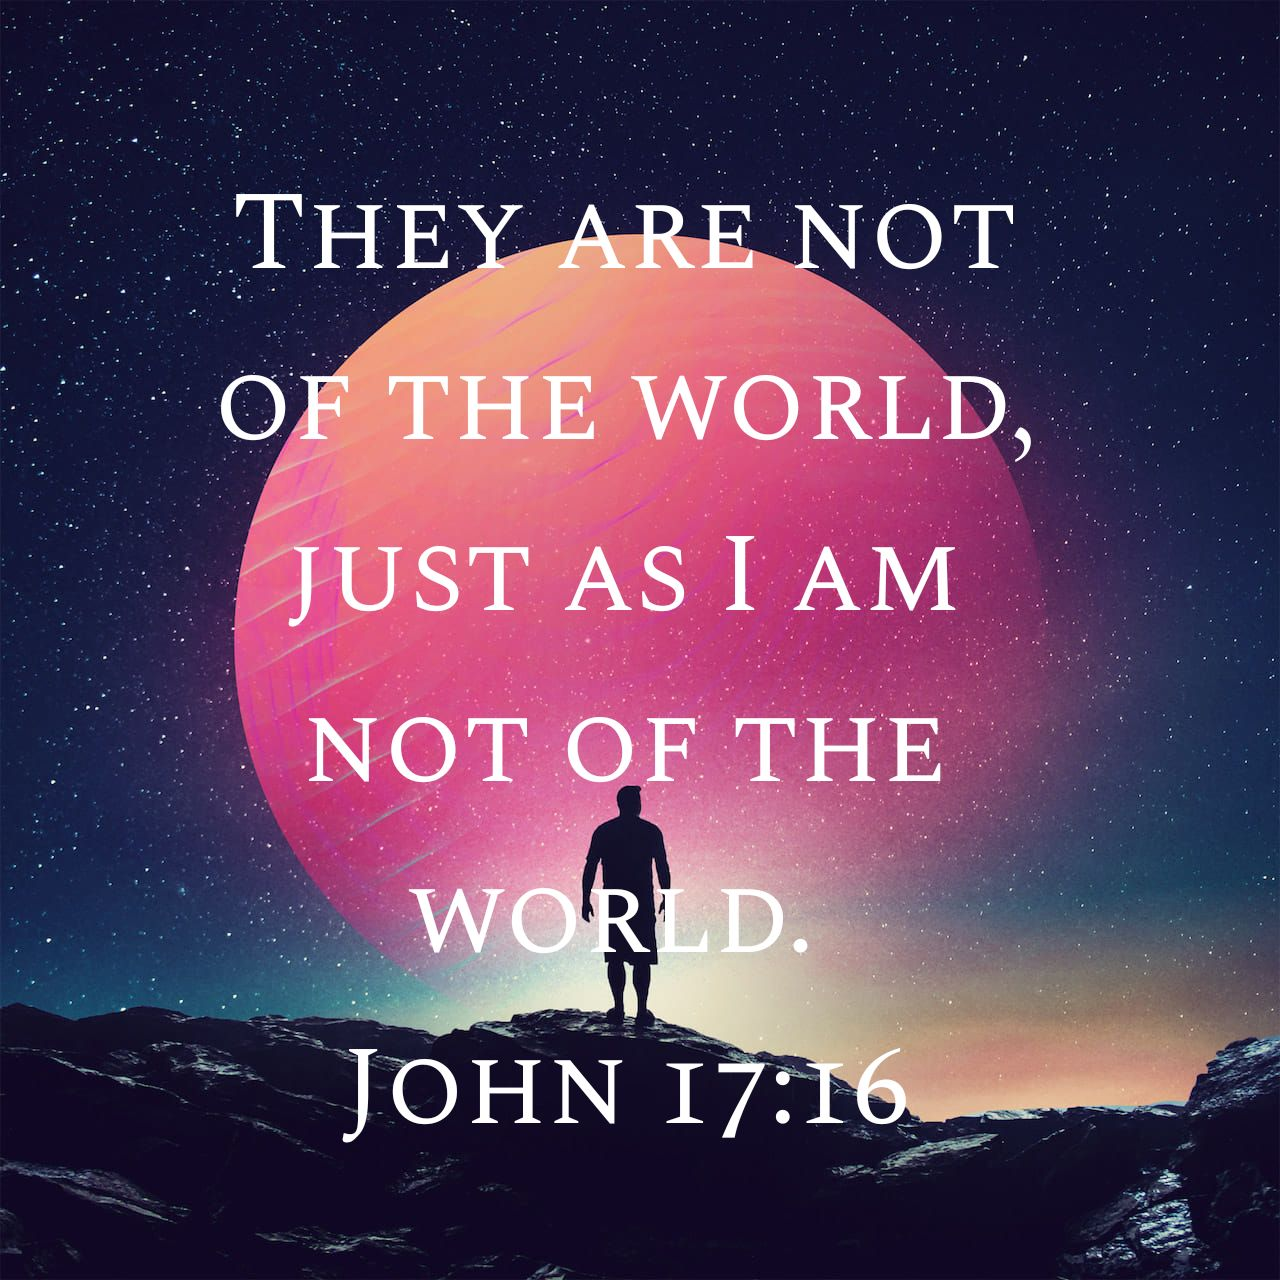 Daily Bible Reading: John 17